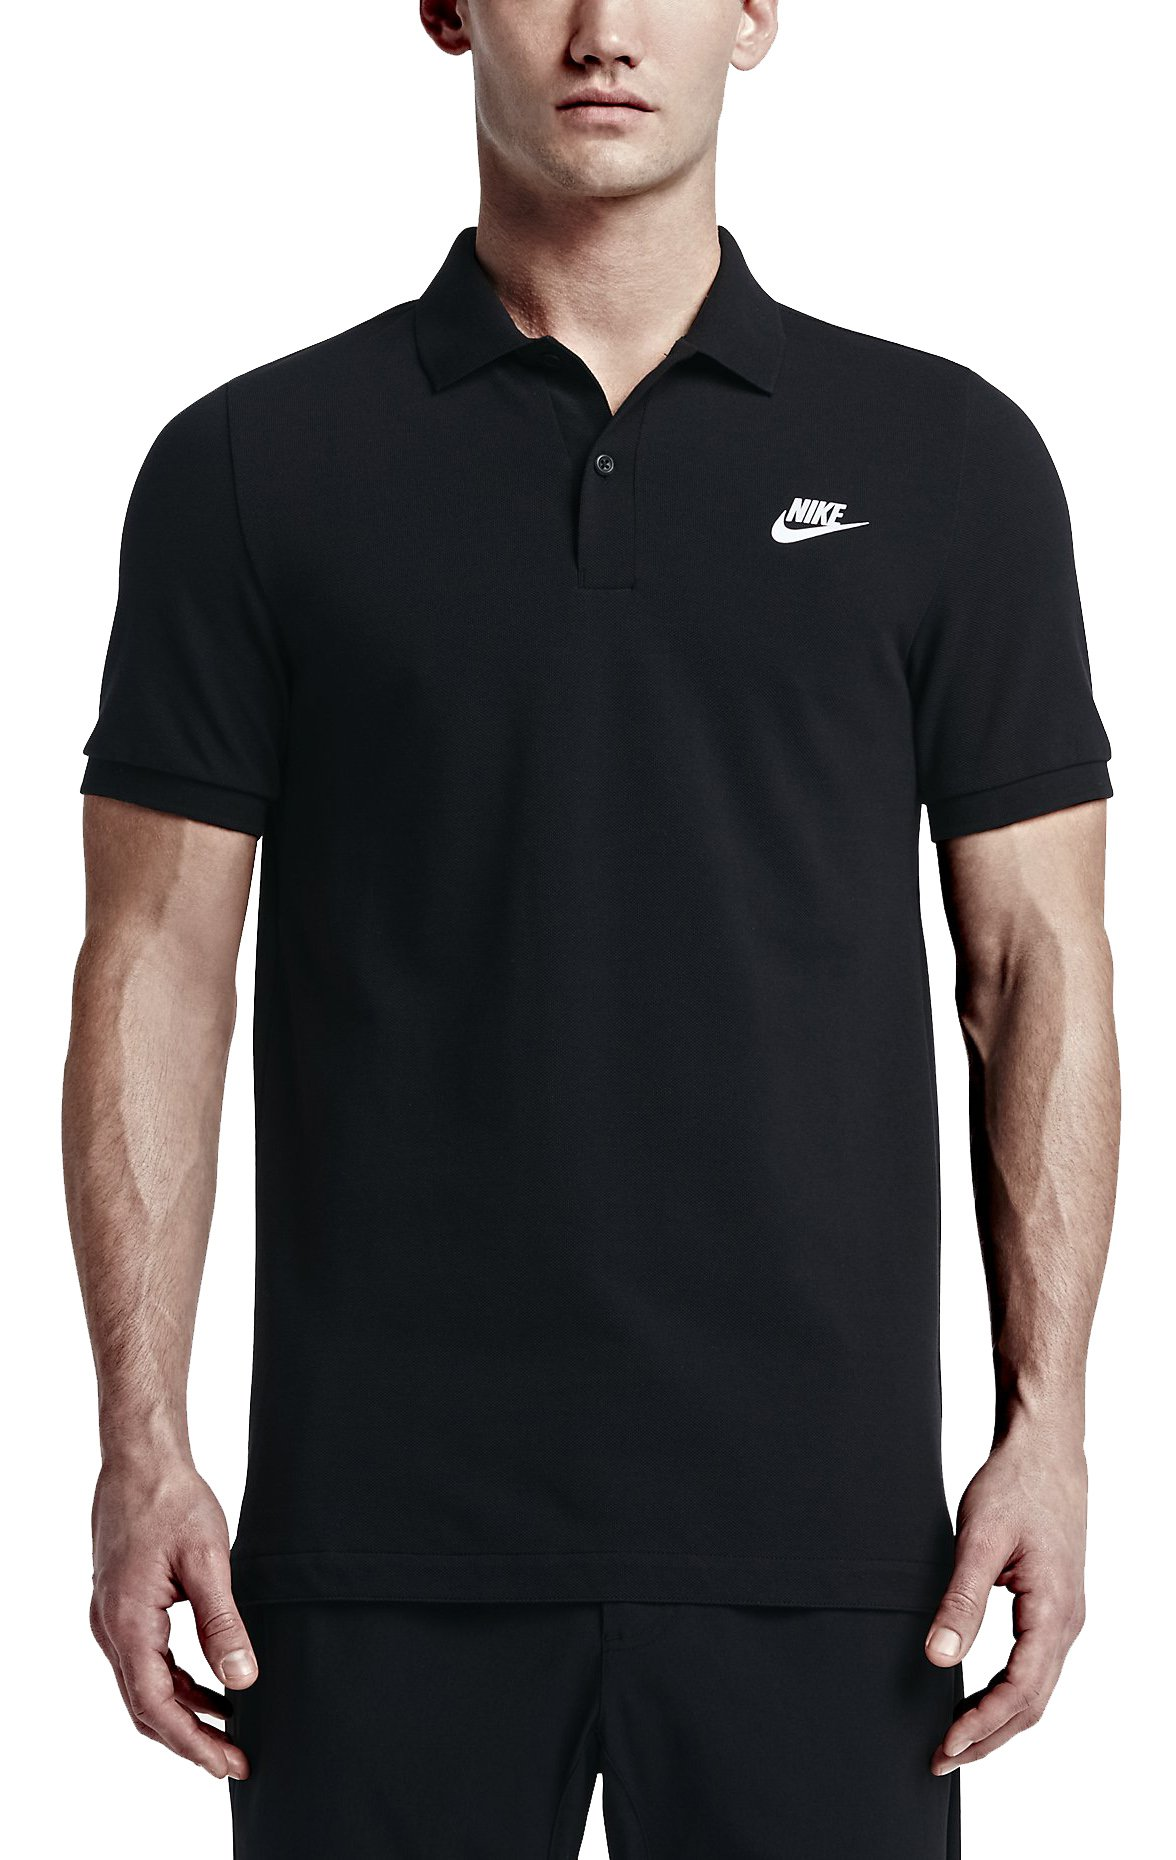 Polokošile Nike Grand Slam Slim